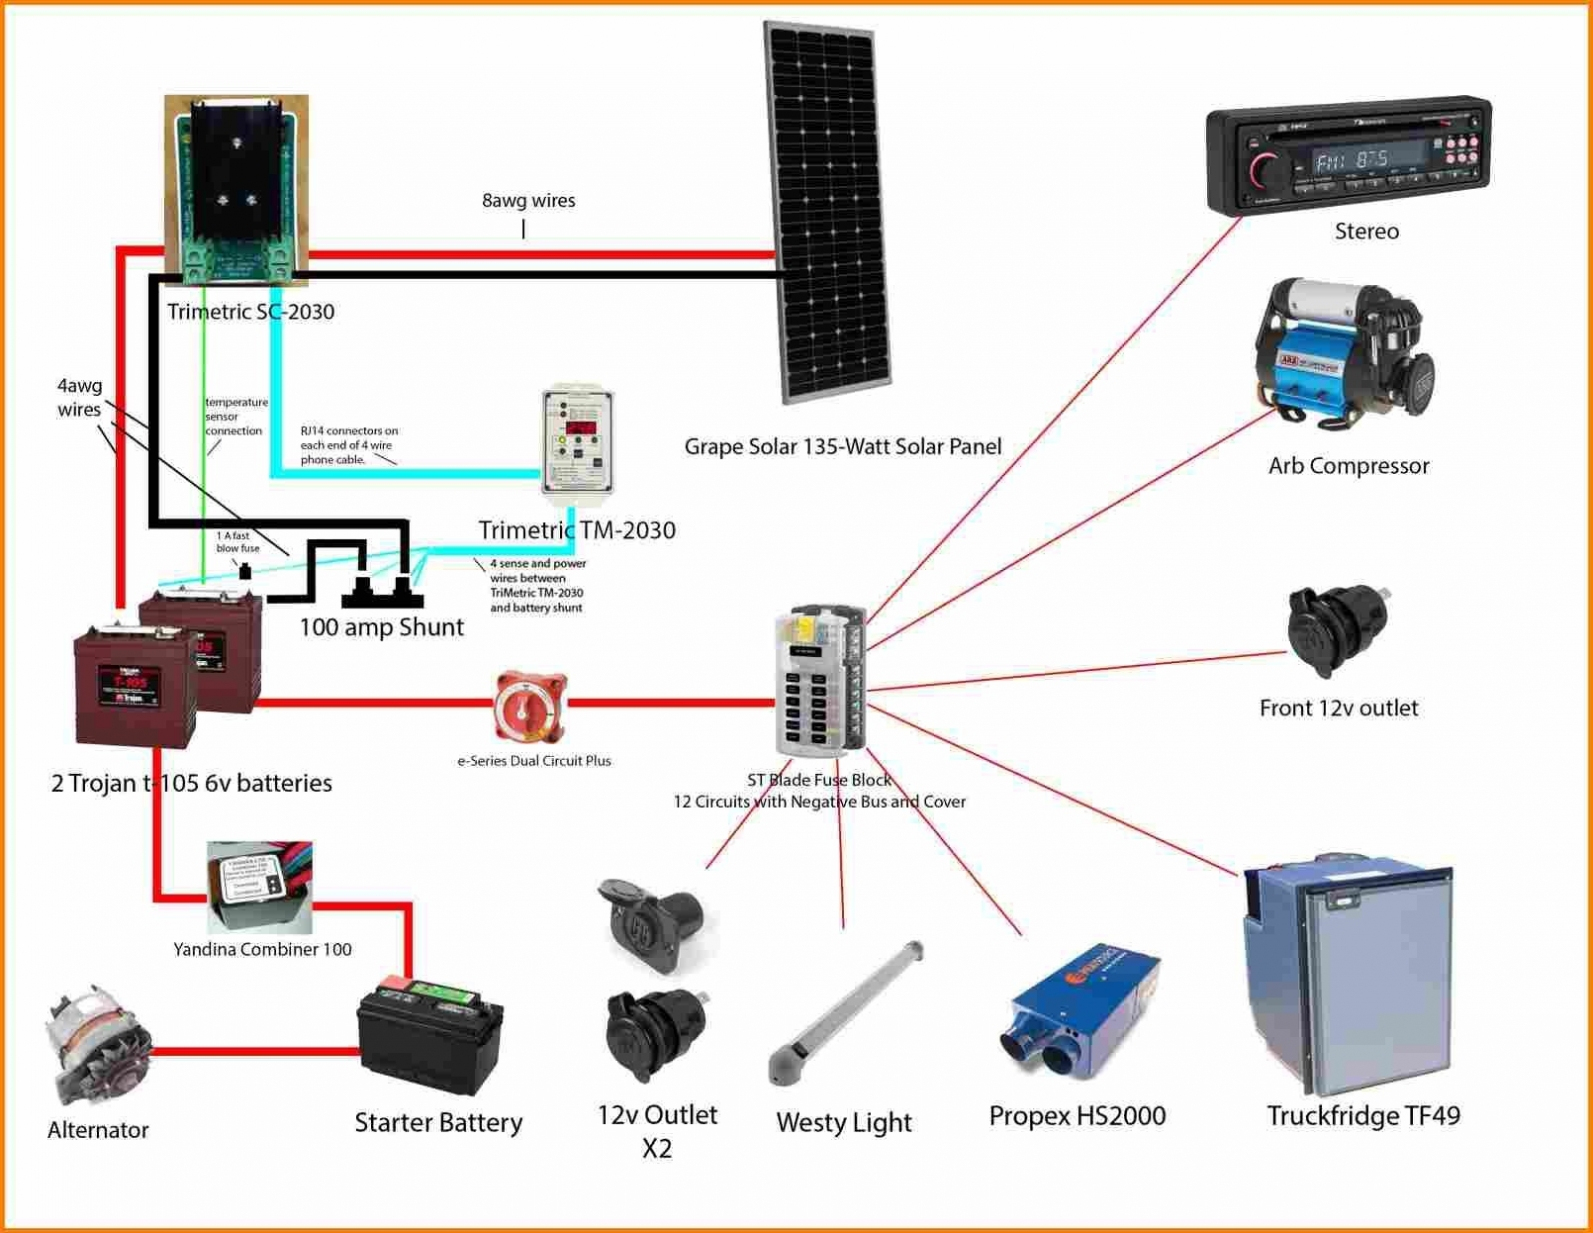 Solar Panel Wiring Alternator - Wiring Diagrams Hubs - Rv Solar Panel Installation Wiring Diagram